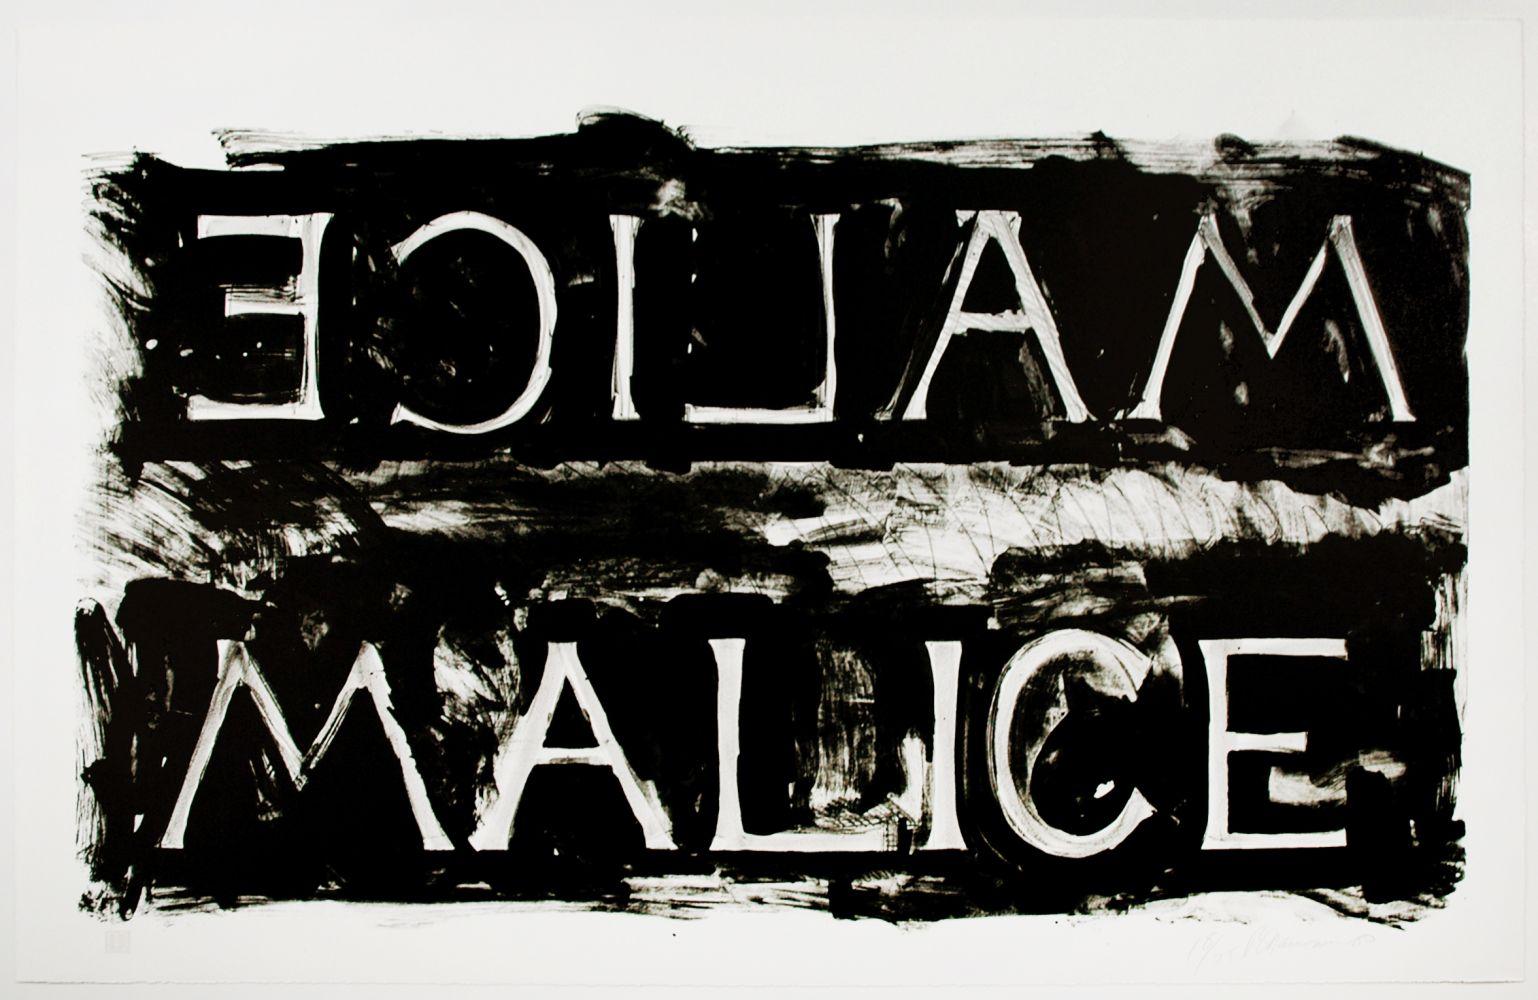 Bruce Nauman: Malice, 1980